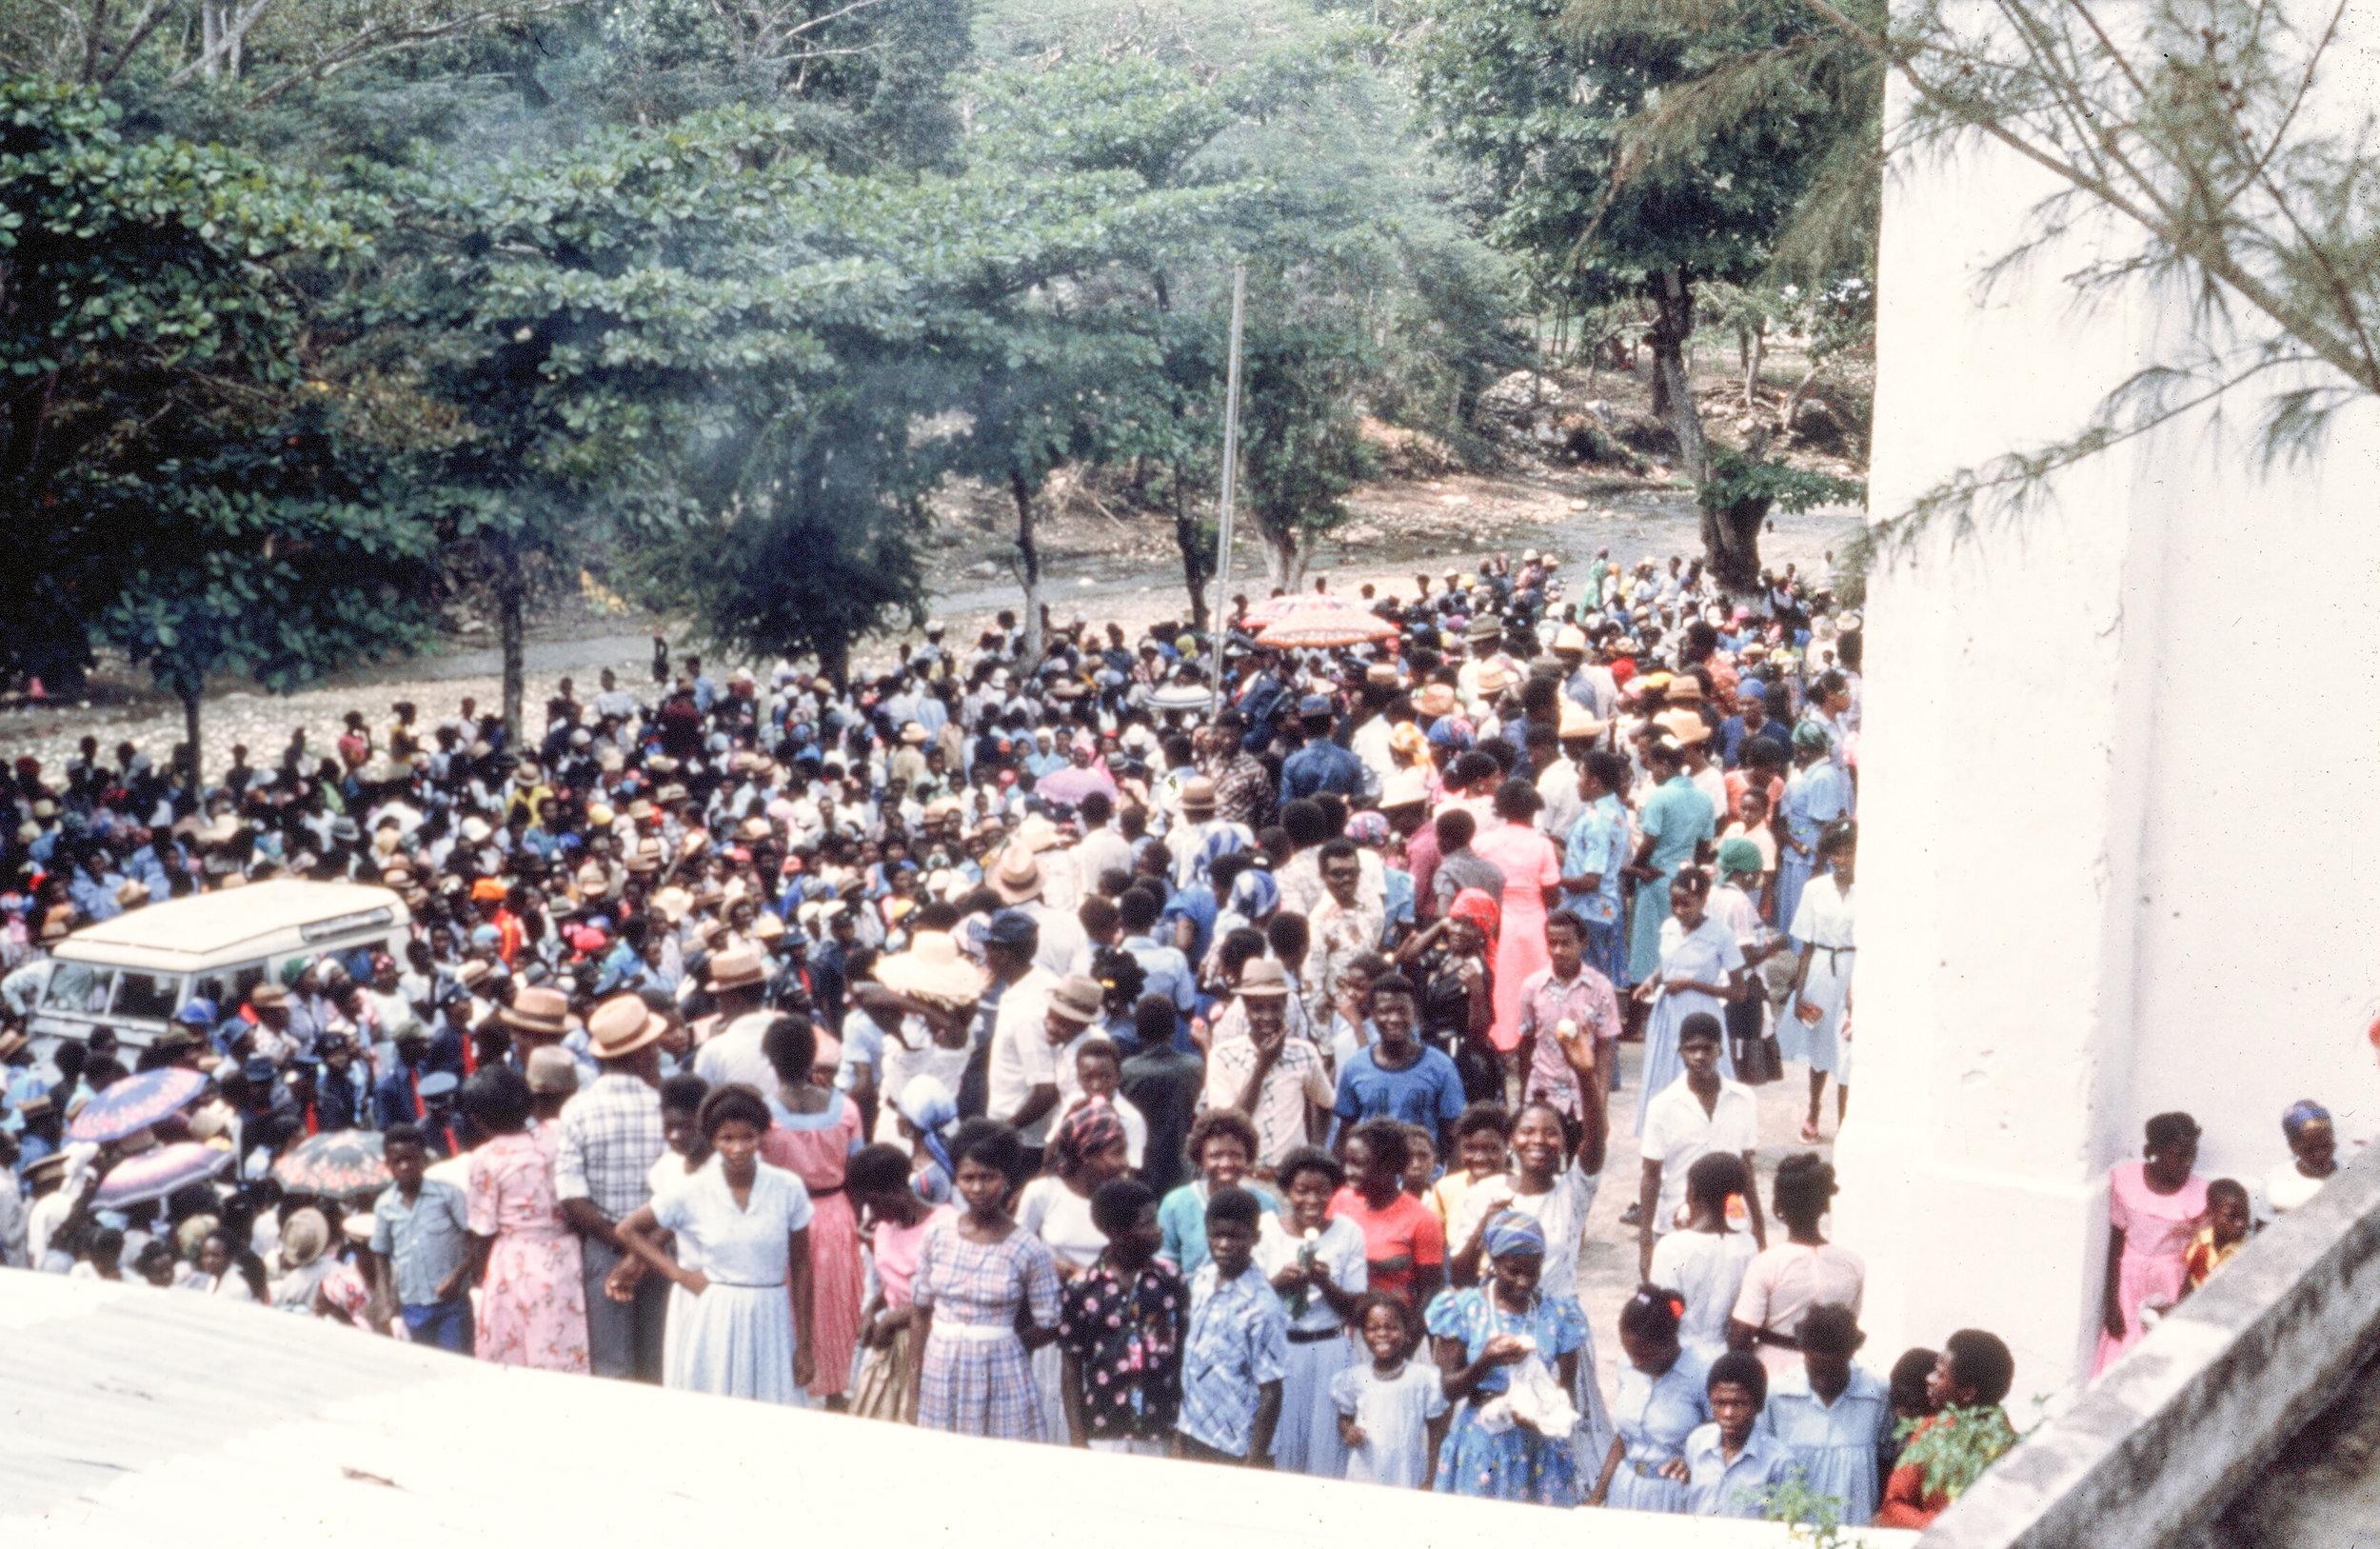 Haitians outside of church.